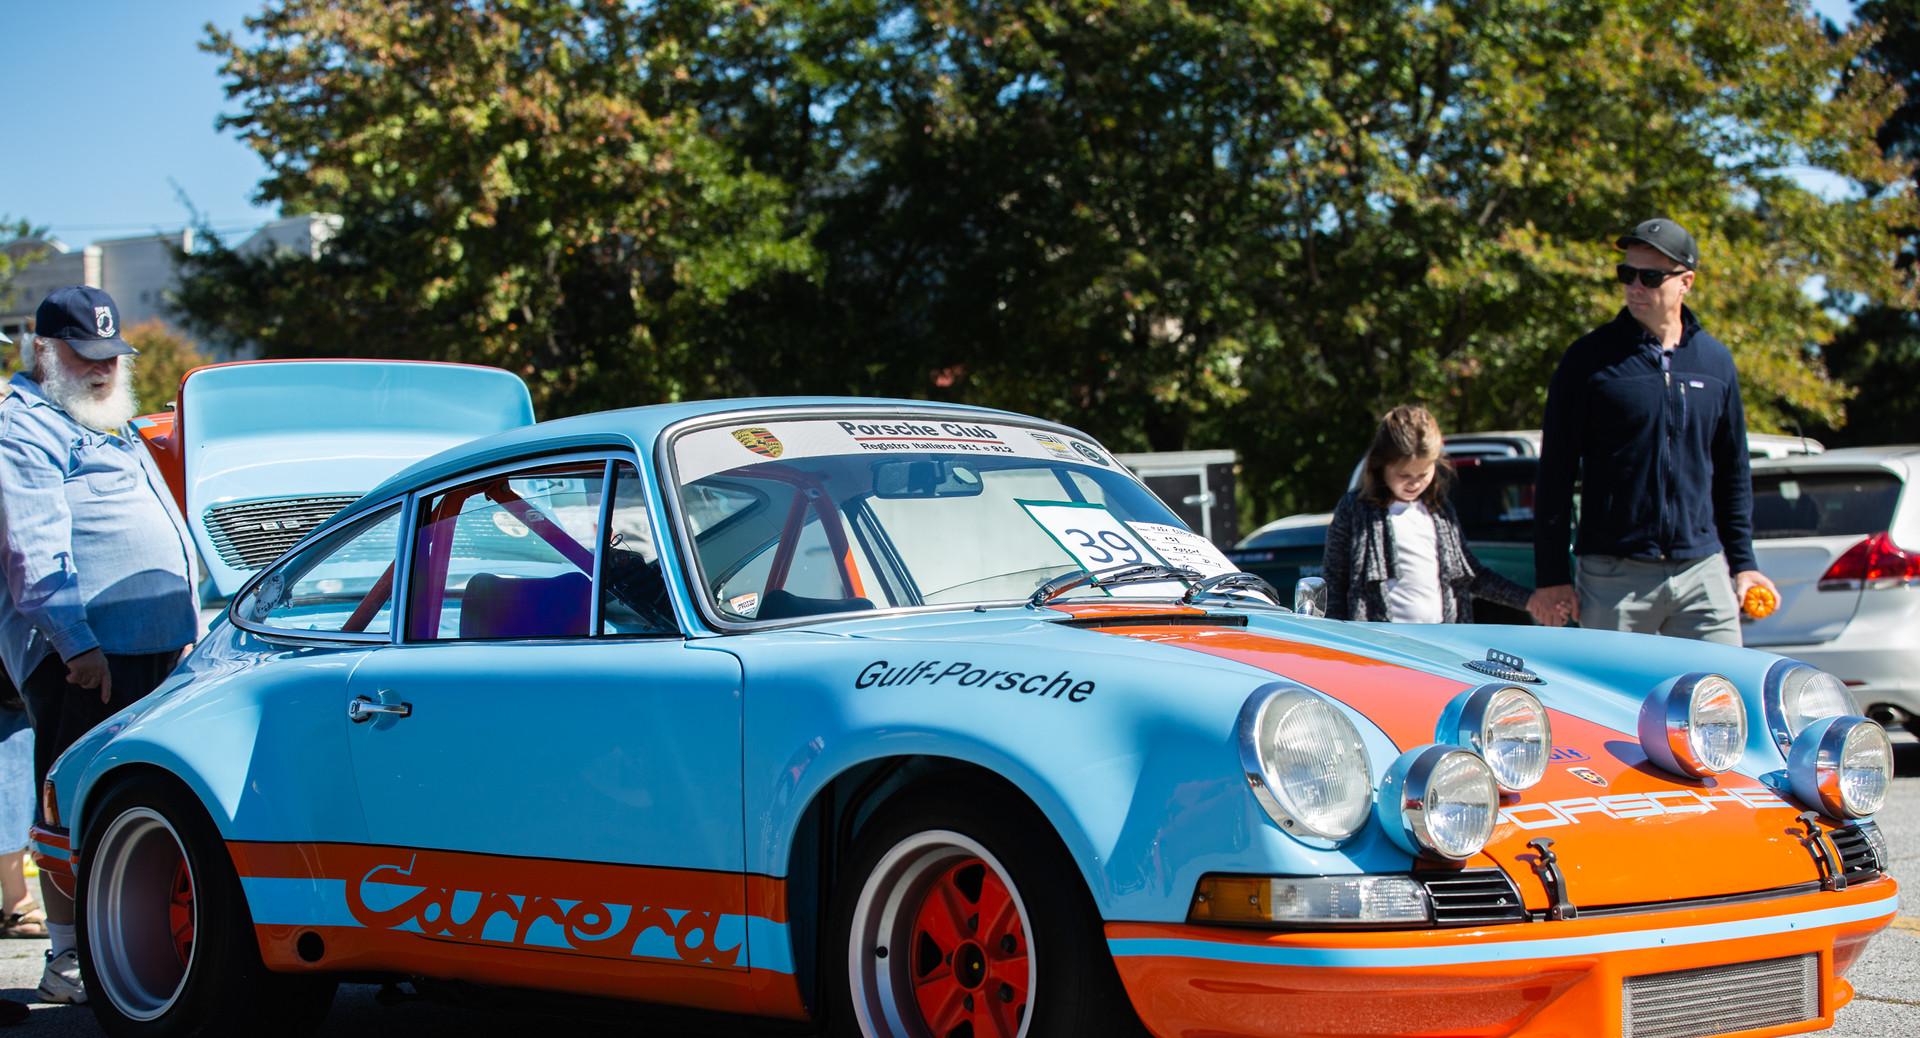 BH Arts Fest Car Show 18 (39 of 170).jpg